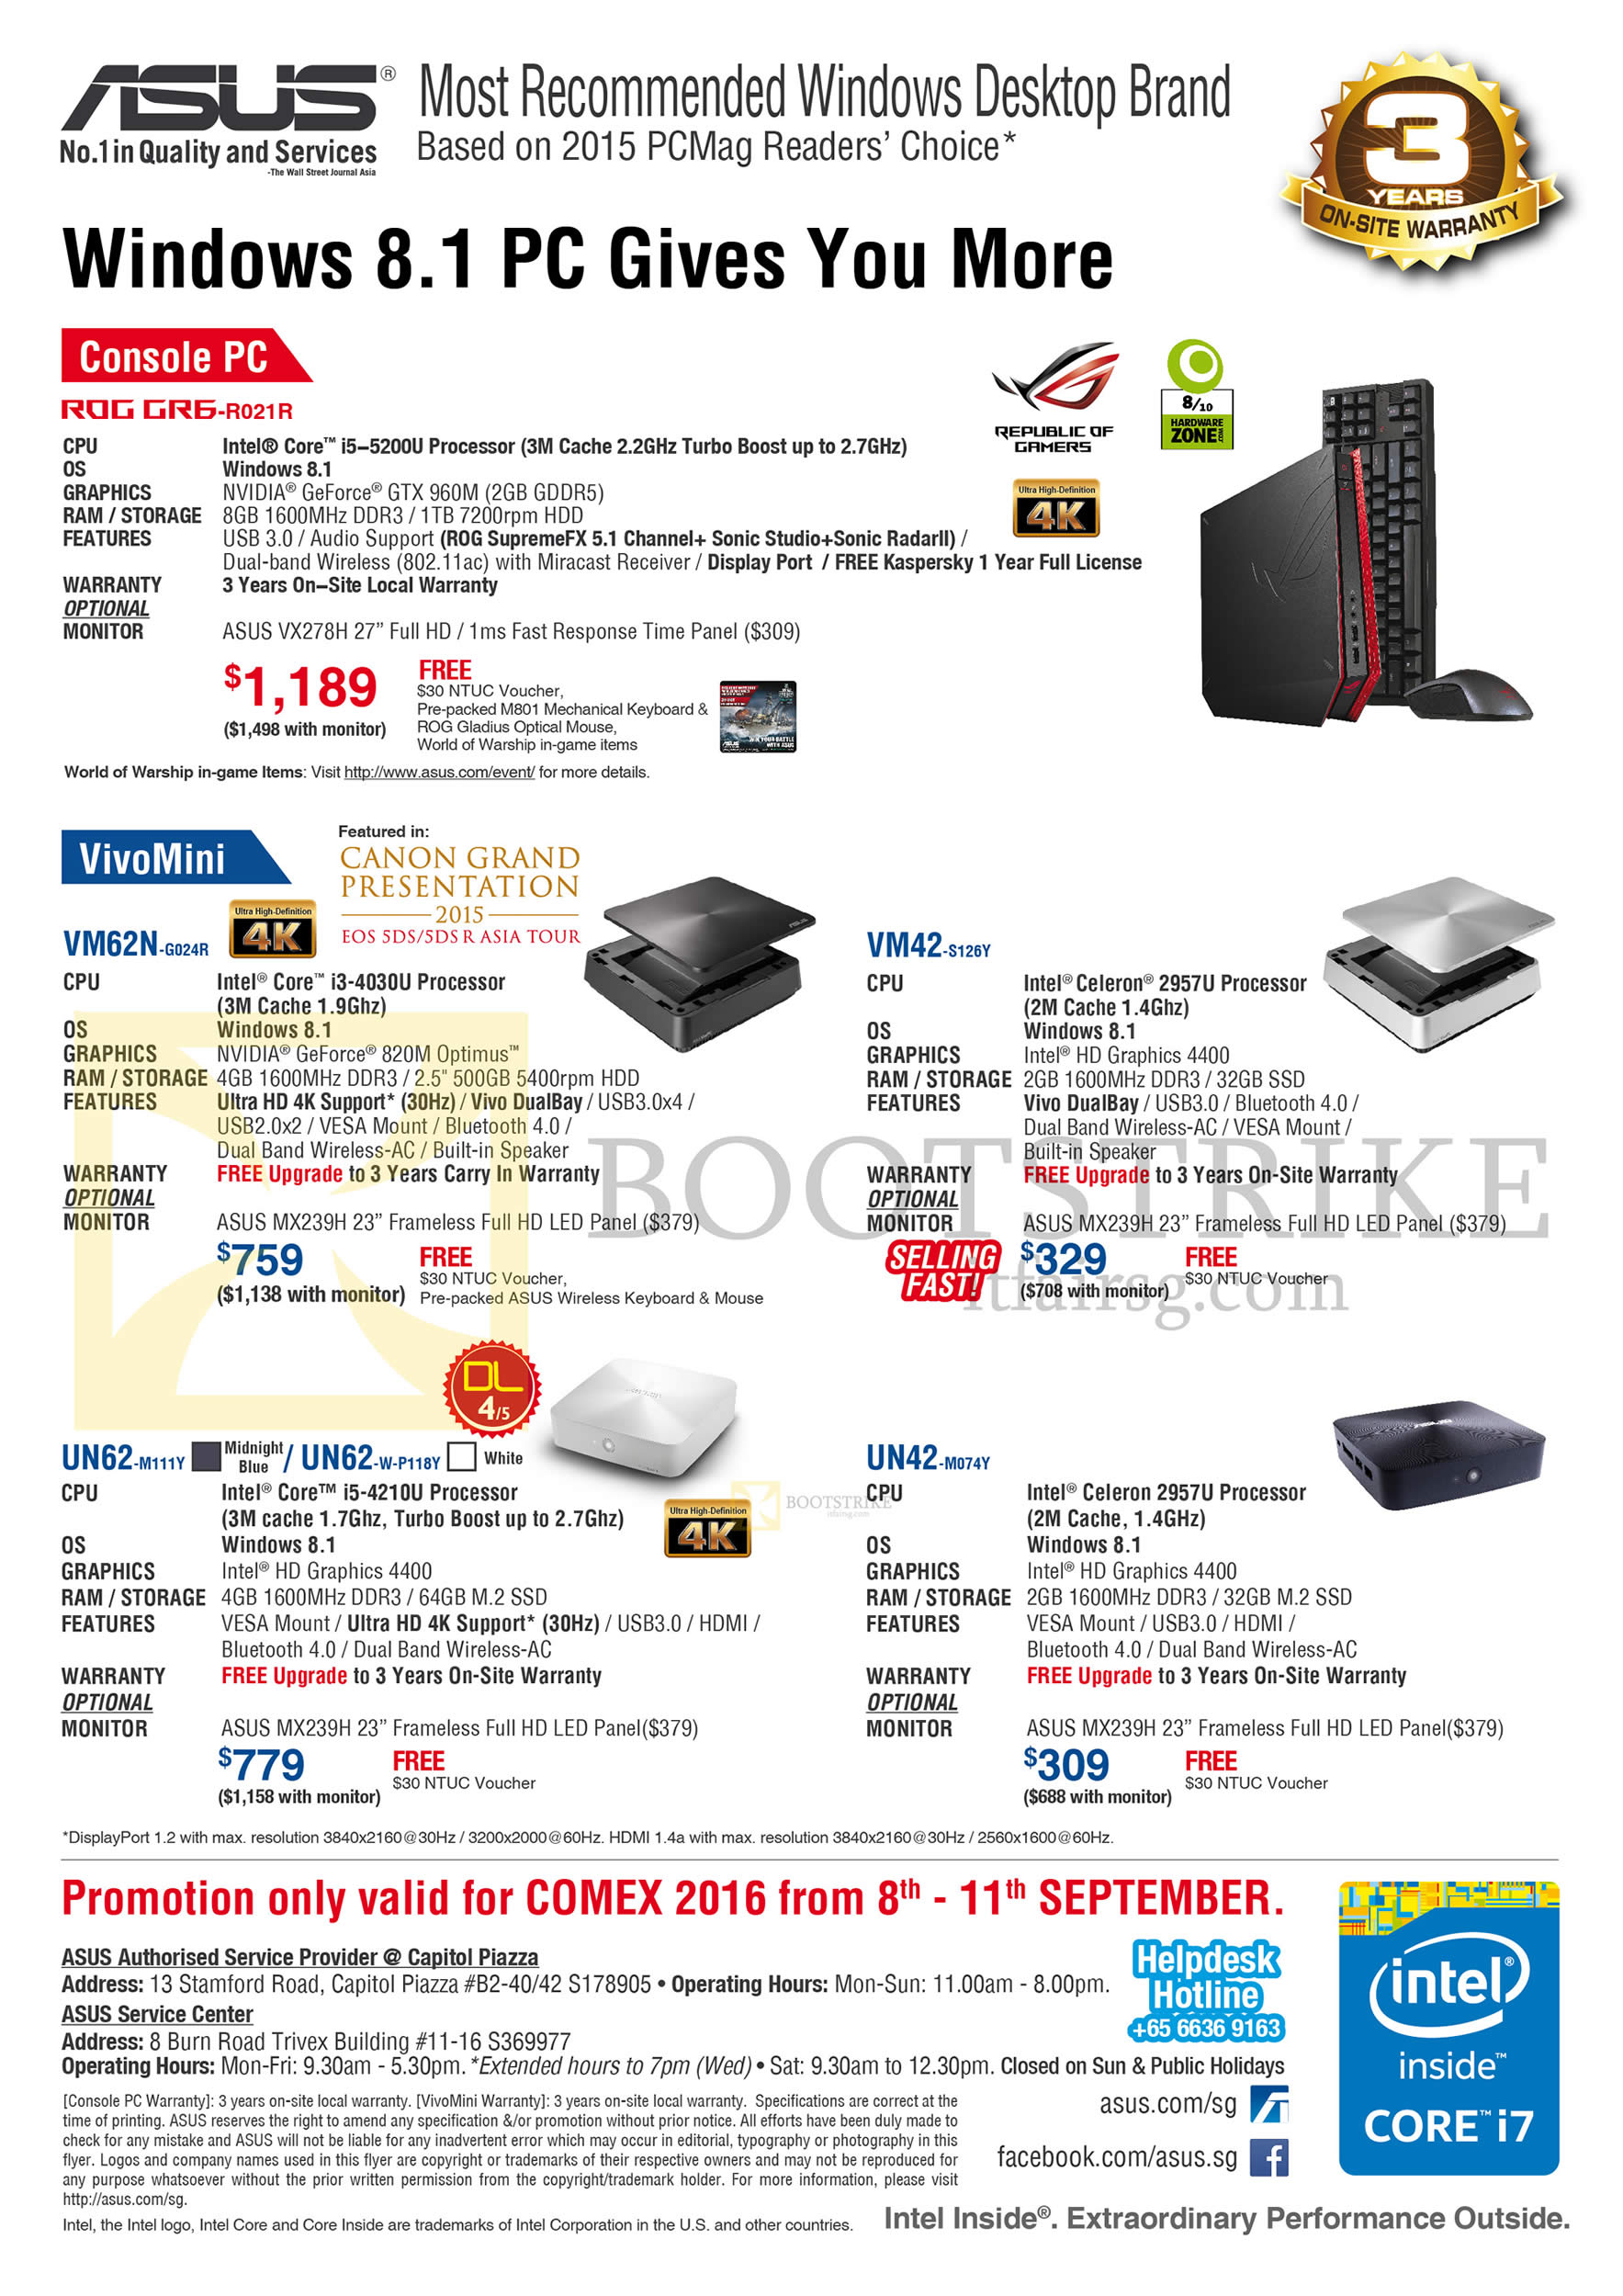 COMEX 2016 price list image brochure of ASUS Desktop PC, ROG GR6-R021R Console, VivoMini, VM62N, VM42, UN62- M111Y, UN42-M074Y